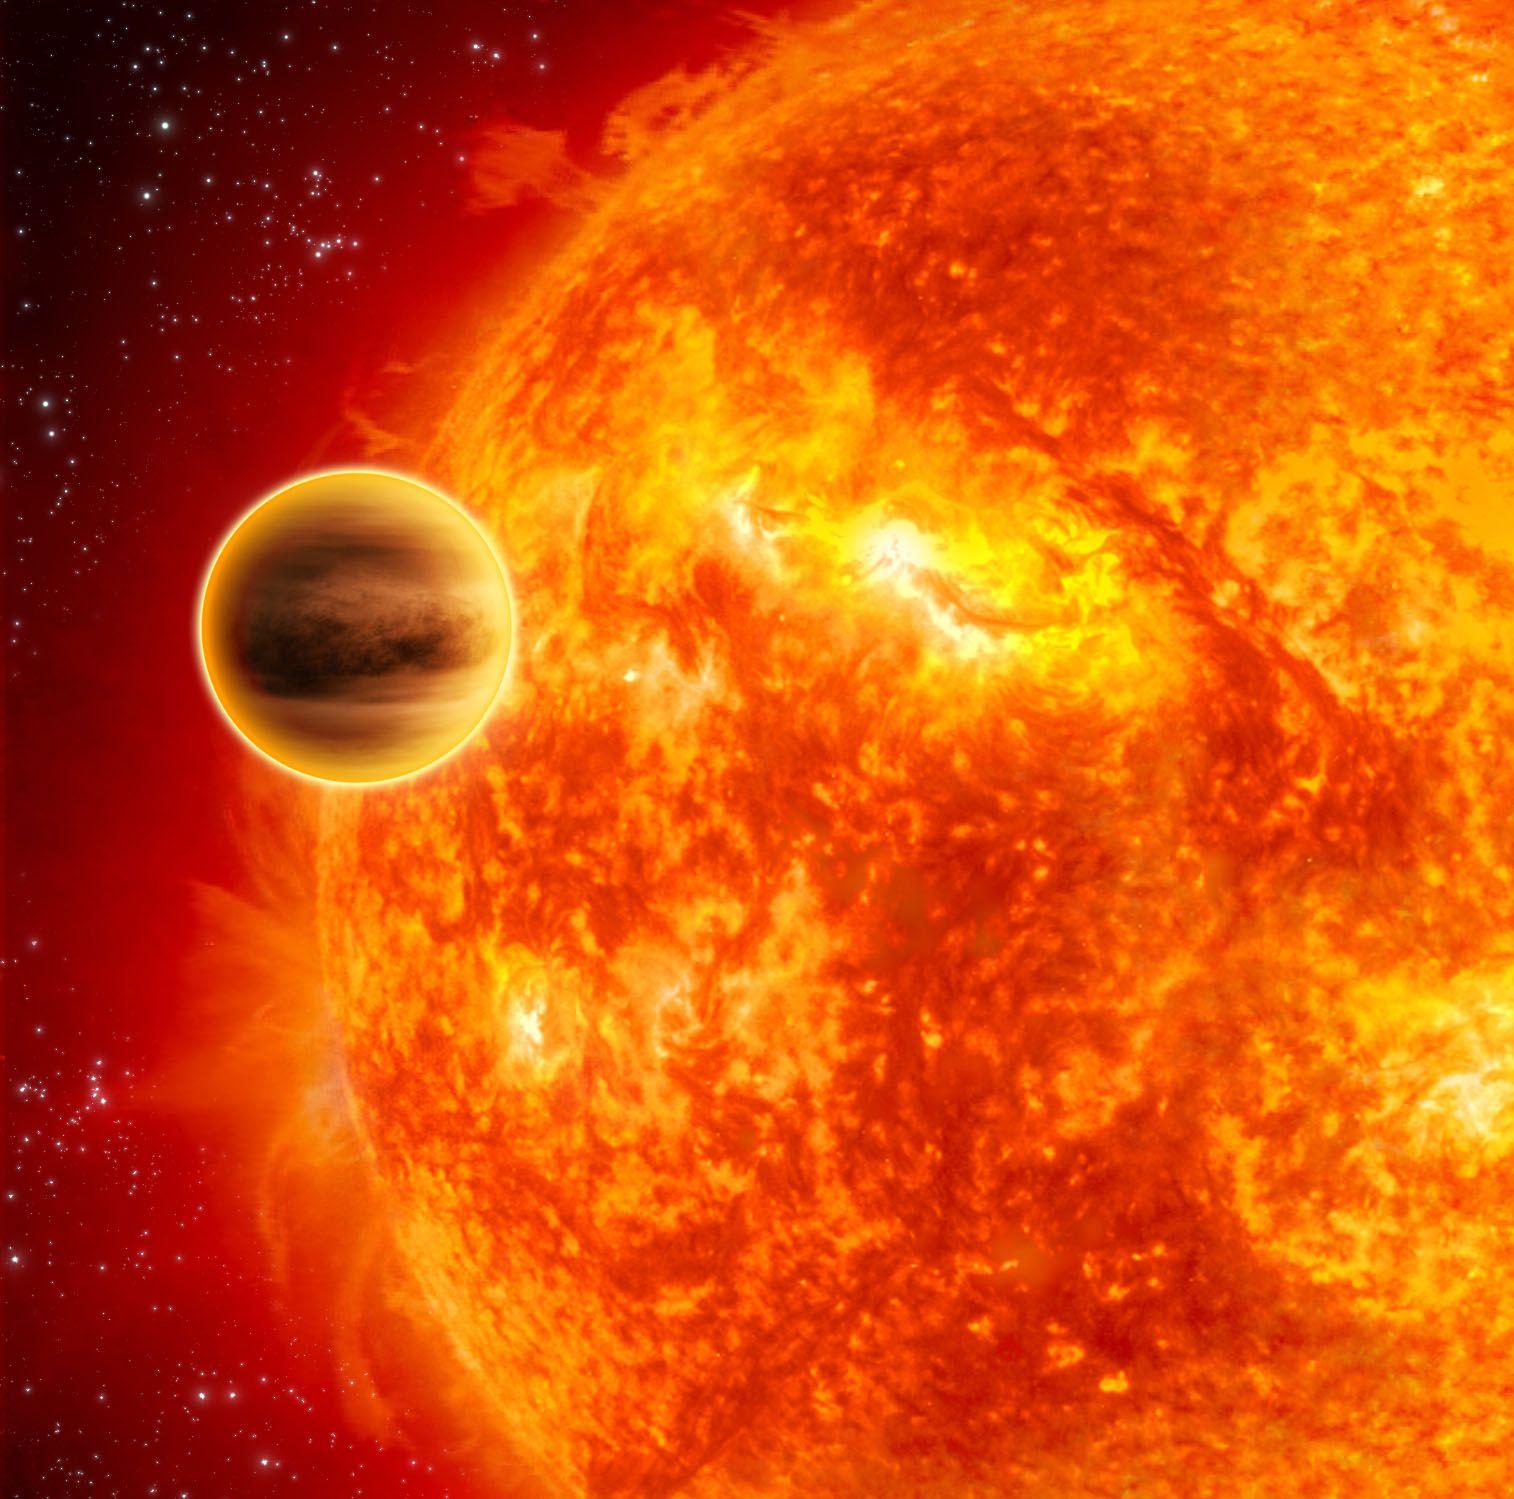 Desktop Backgrounds 4U Planets 1514x1499